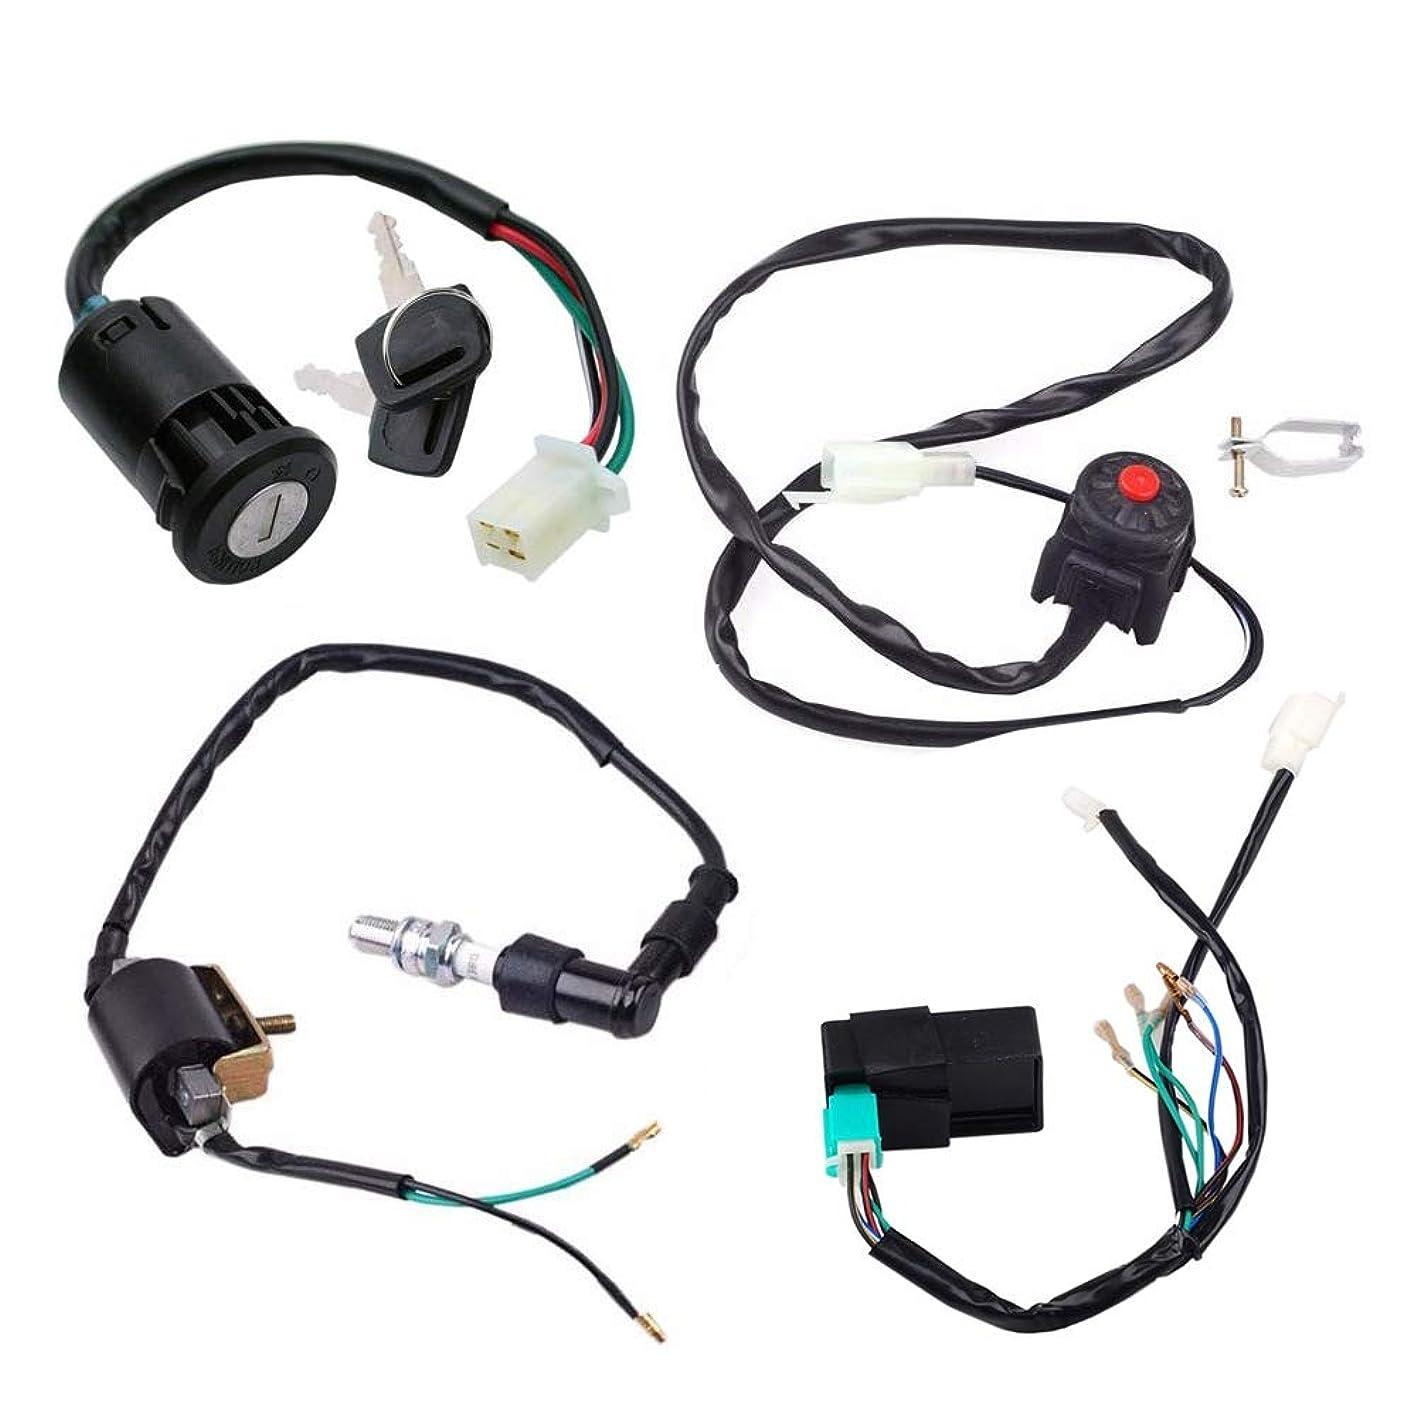 Triumilynn Wire Harness Wiring Loom CDI Ignition Coil Spark Plug Rebuild Kit for 50cc 70cc 90cc 110cc 125cc 160cc Engine ATV Quad Bike Go Kart Kick Start Dirt Pit Bike soooiraeztb799